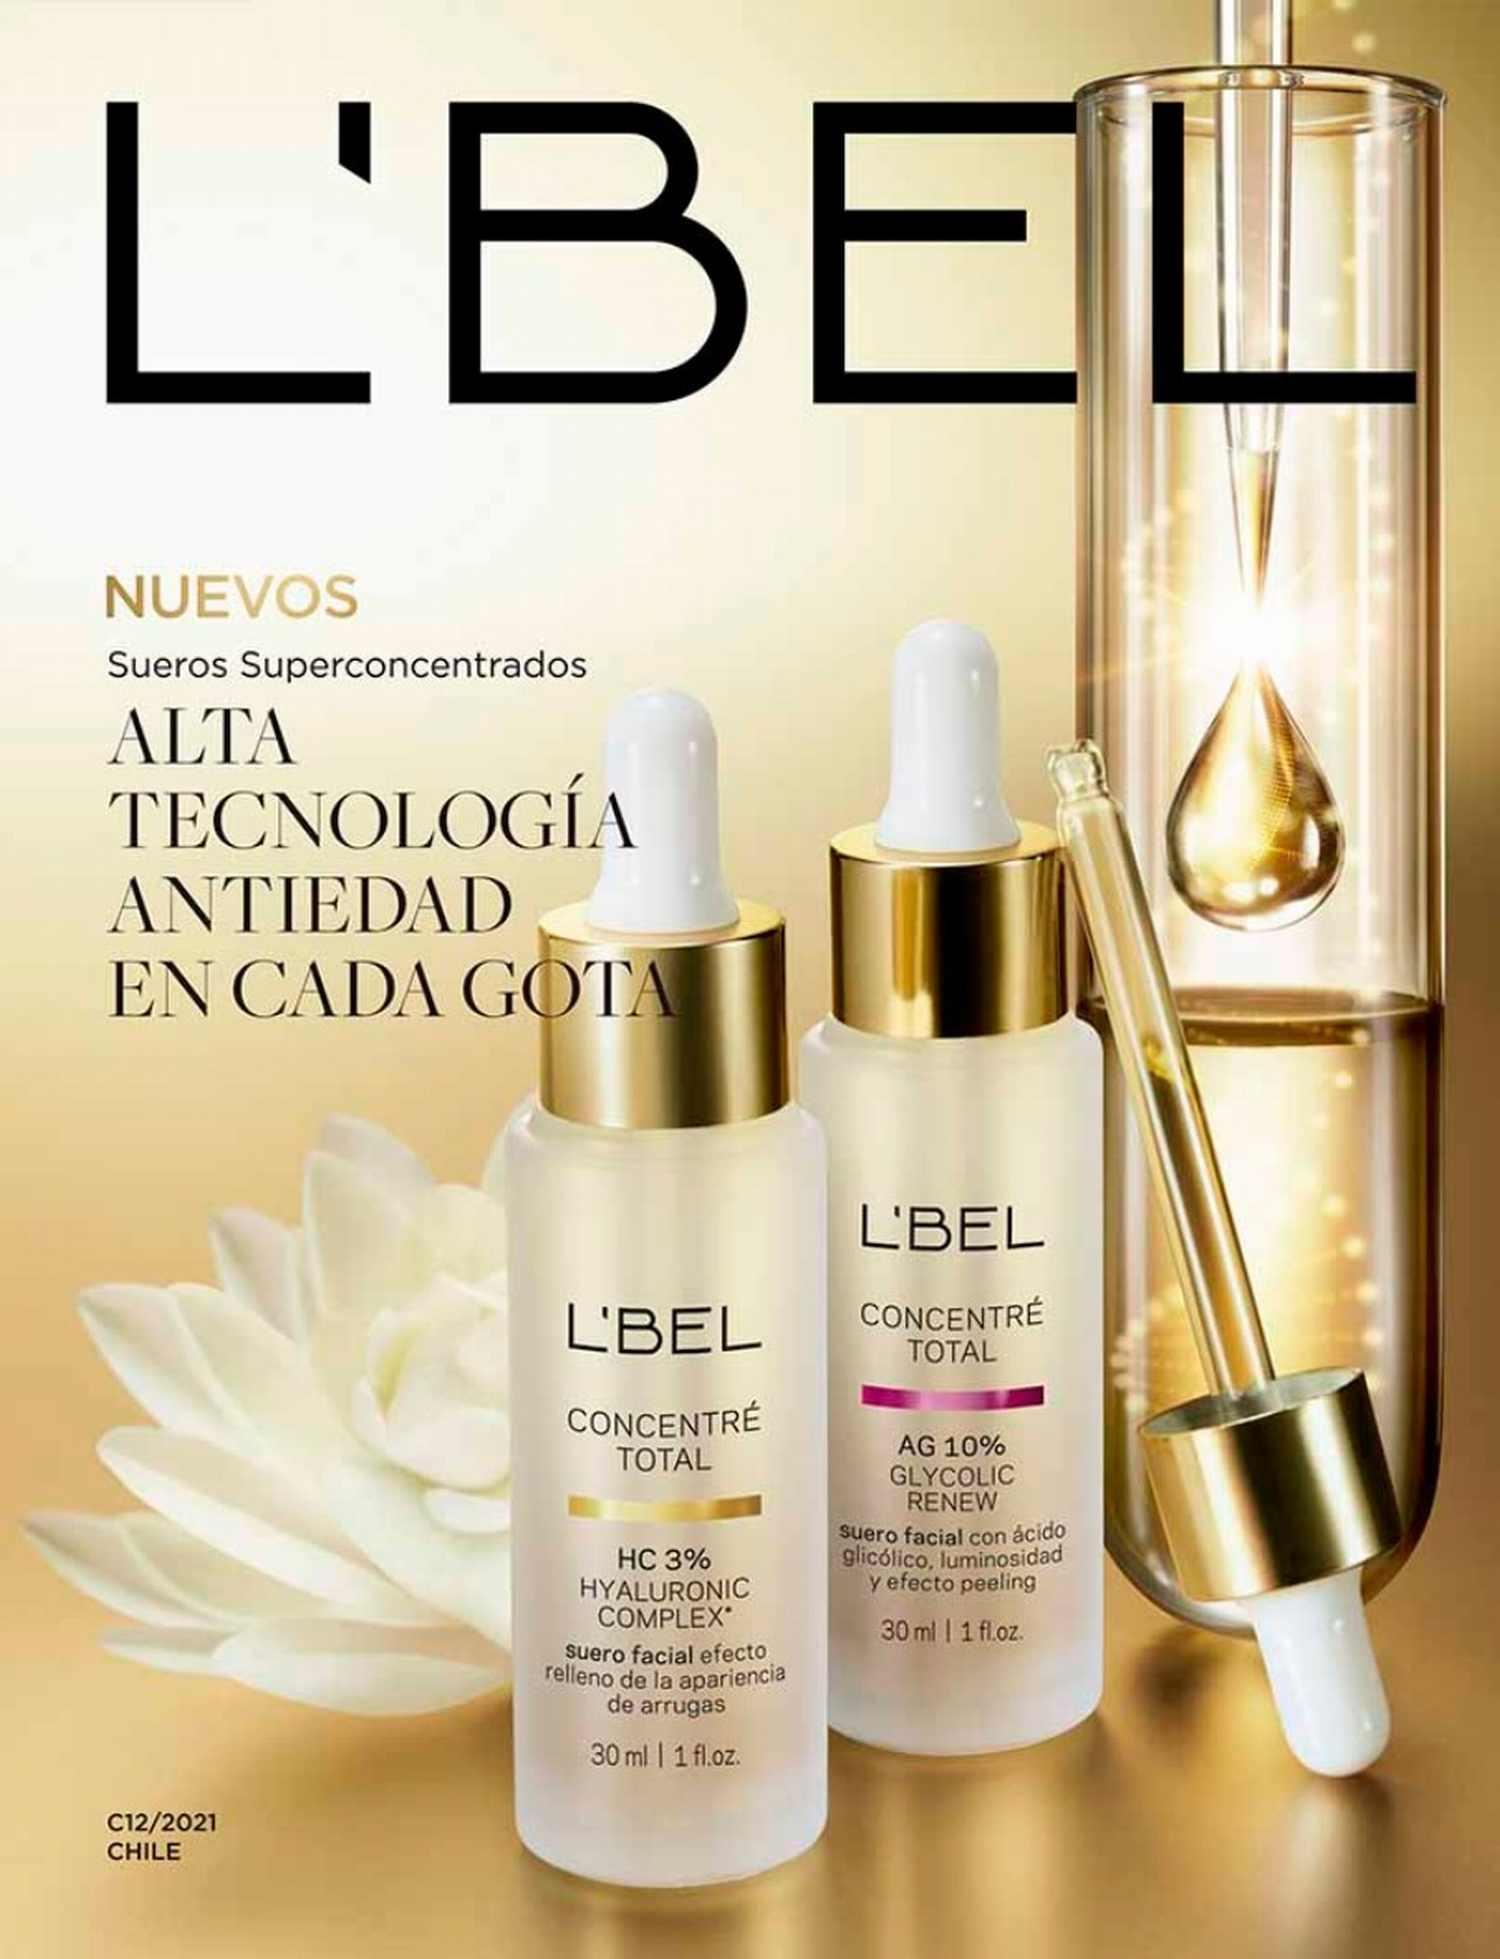 Catálogo L'Bel Campaña 12 2021 Chile